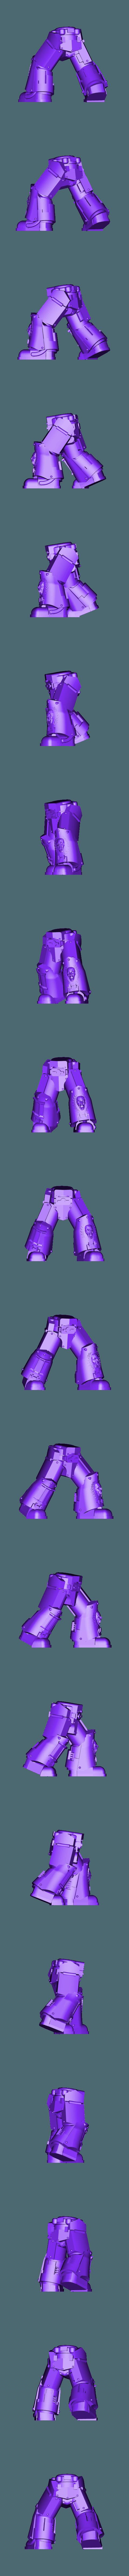 Legs_5_repaired.stl Download free STL file 1000 Followers! 3rd Legion - FireBird Terminators • 3D printing model, ThatEvilOne